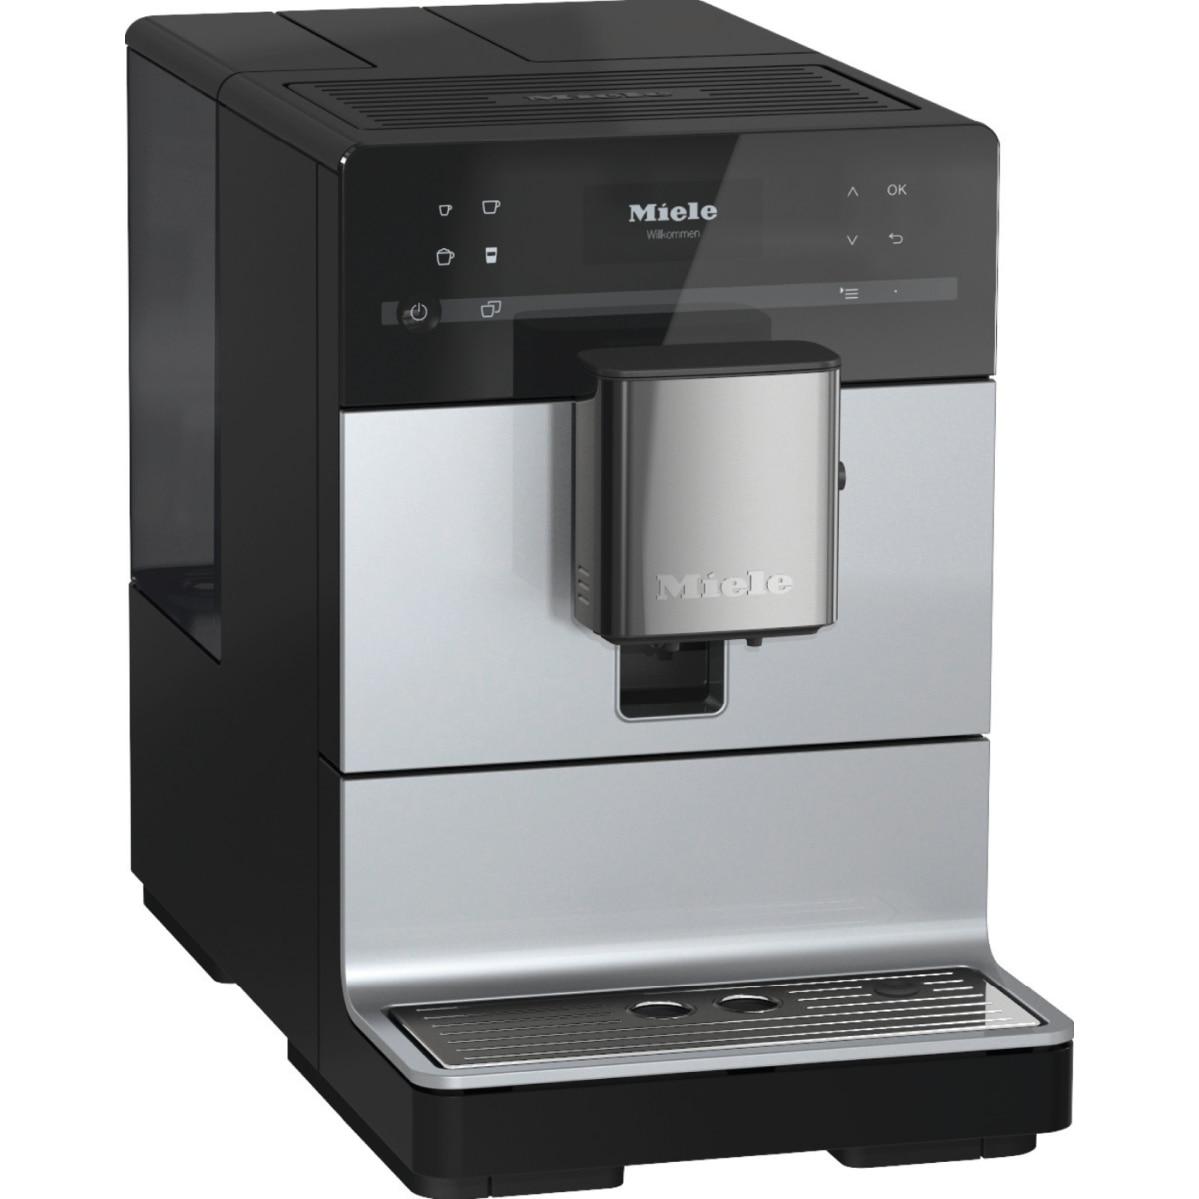 Fotografie Espressor automat Miele CM 5310 Silence Silver, 15 bar, 1.3 L, OneTouch for Two, AromaticSystem, Profiluri utilizator, Argintiu